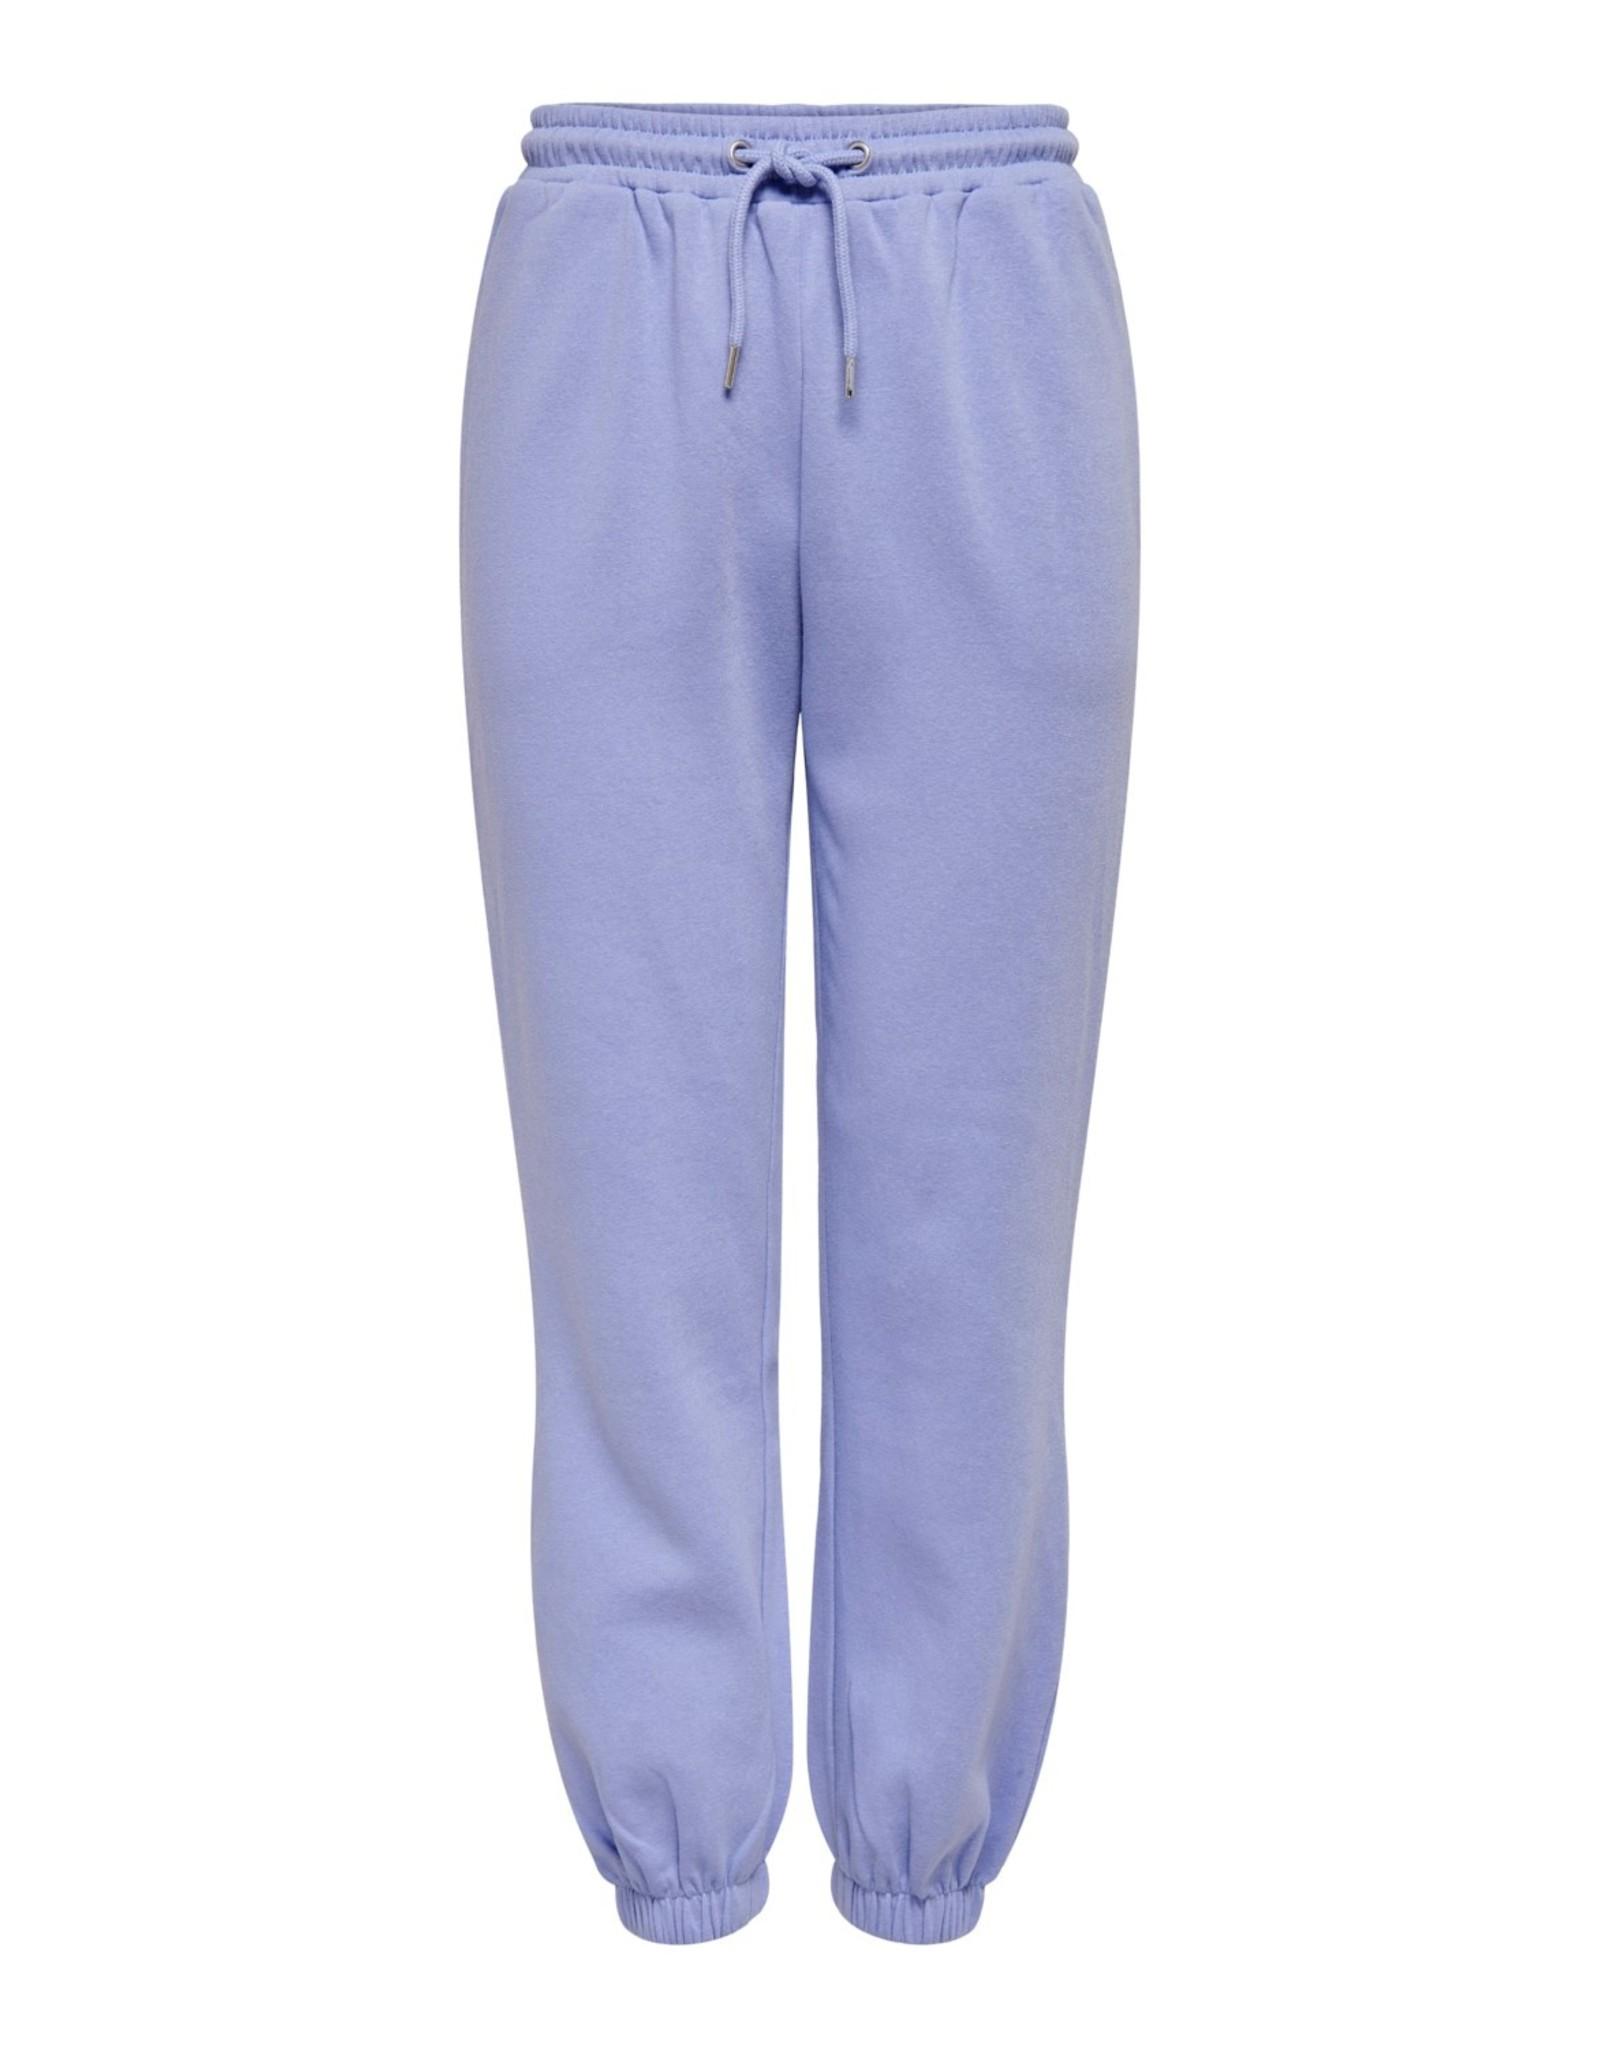 SWEAT PANTS BLUE/LILAC